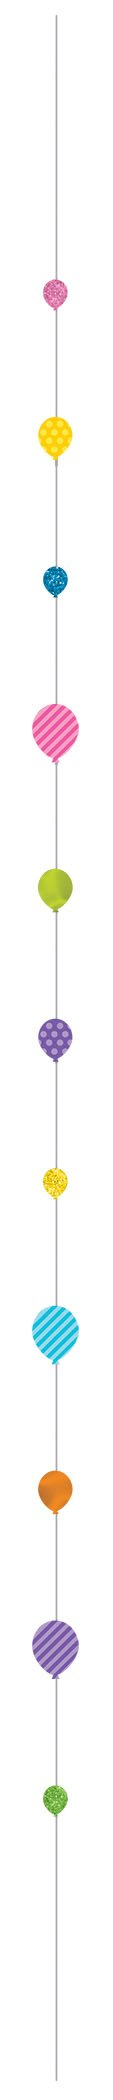 Balloon Fun Strings Balloon Brights